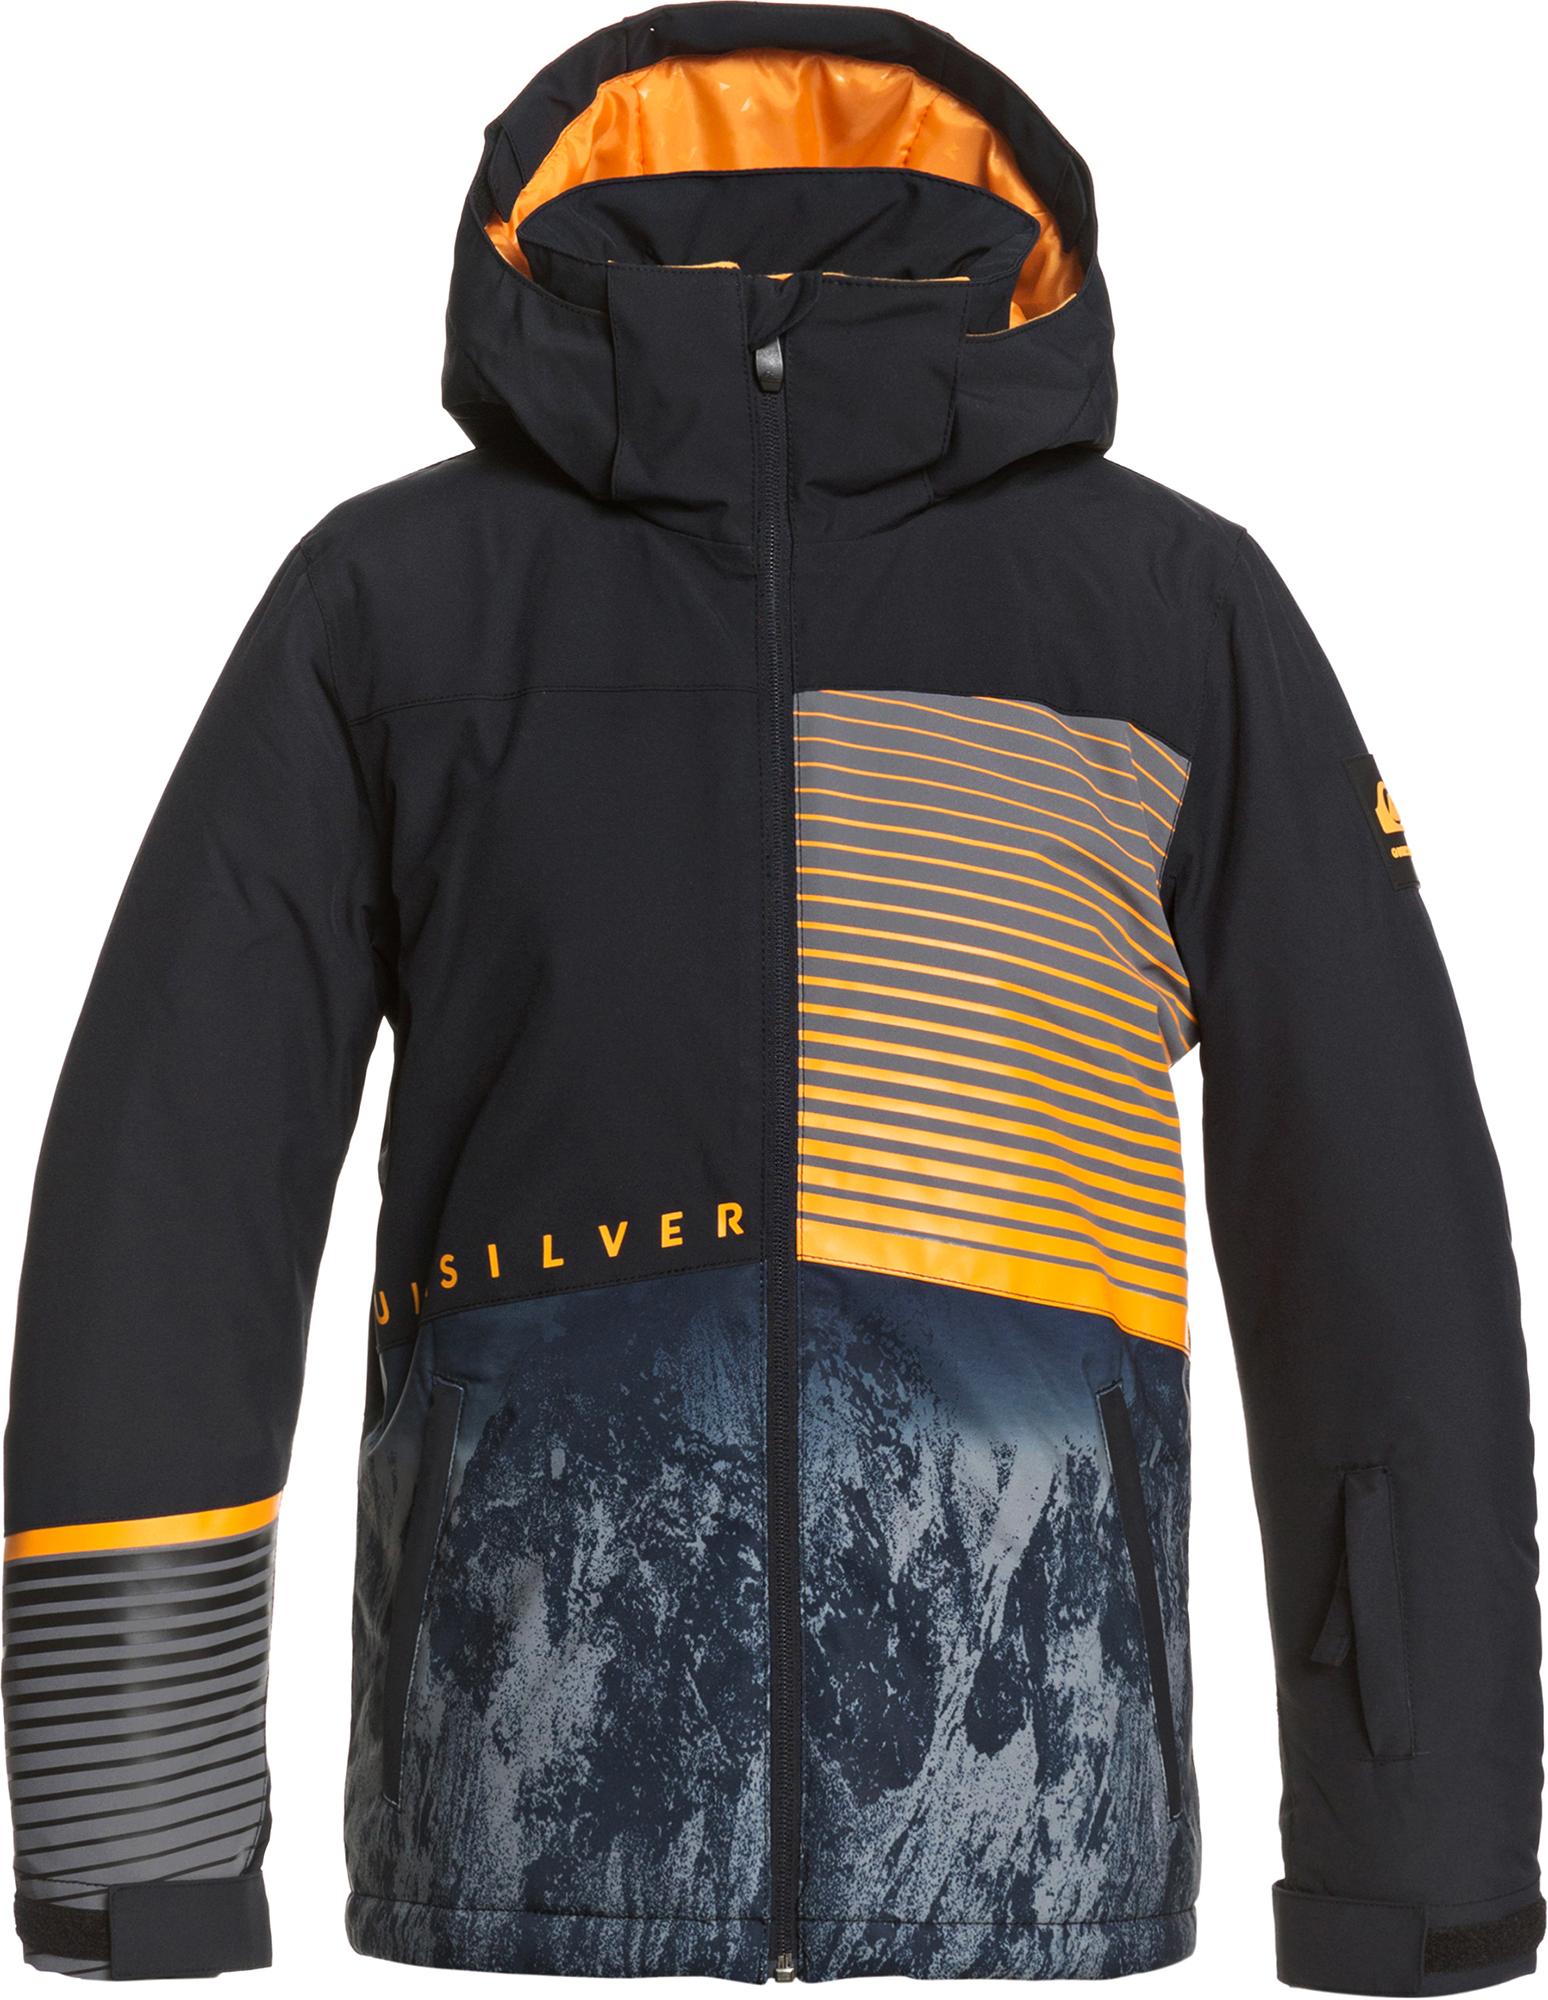 Quiksilver Куртка утепленная для мальчиков Quiksilver Silvertip, размер 134-140